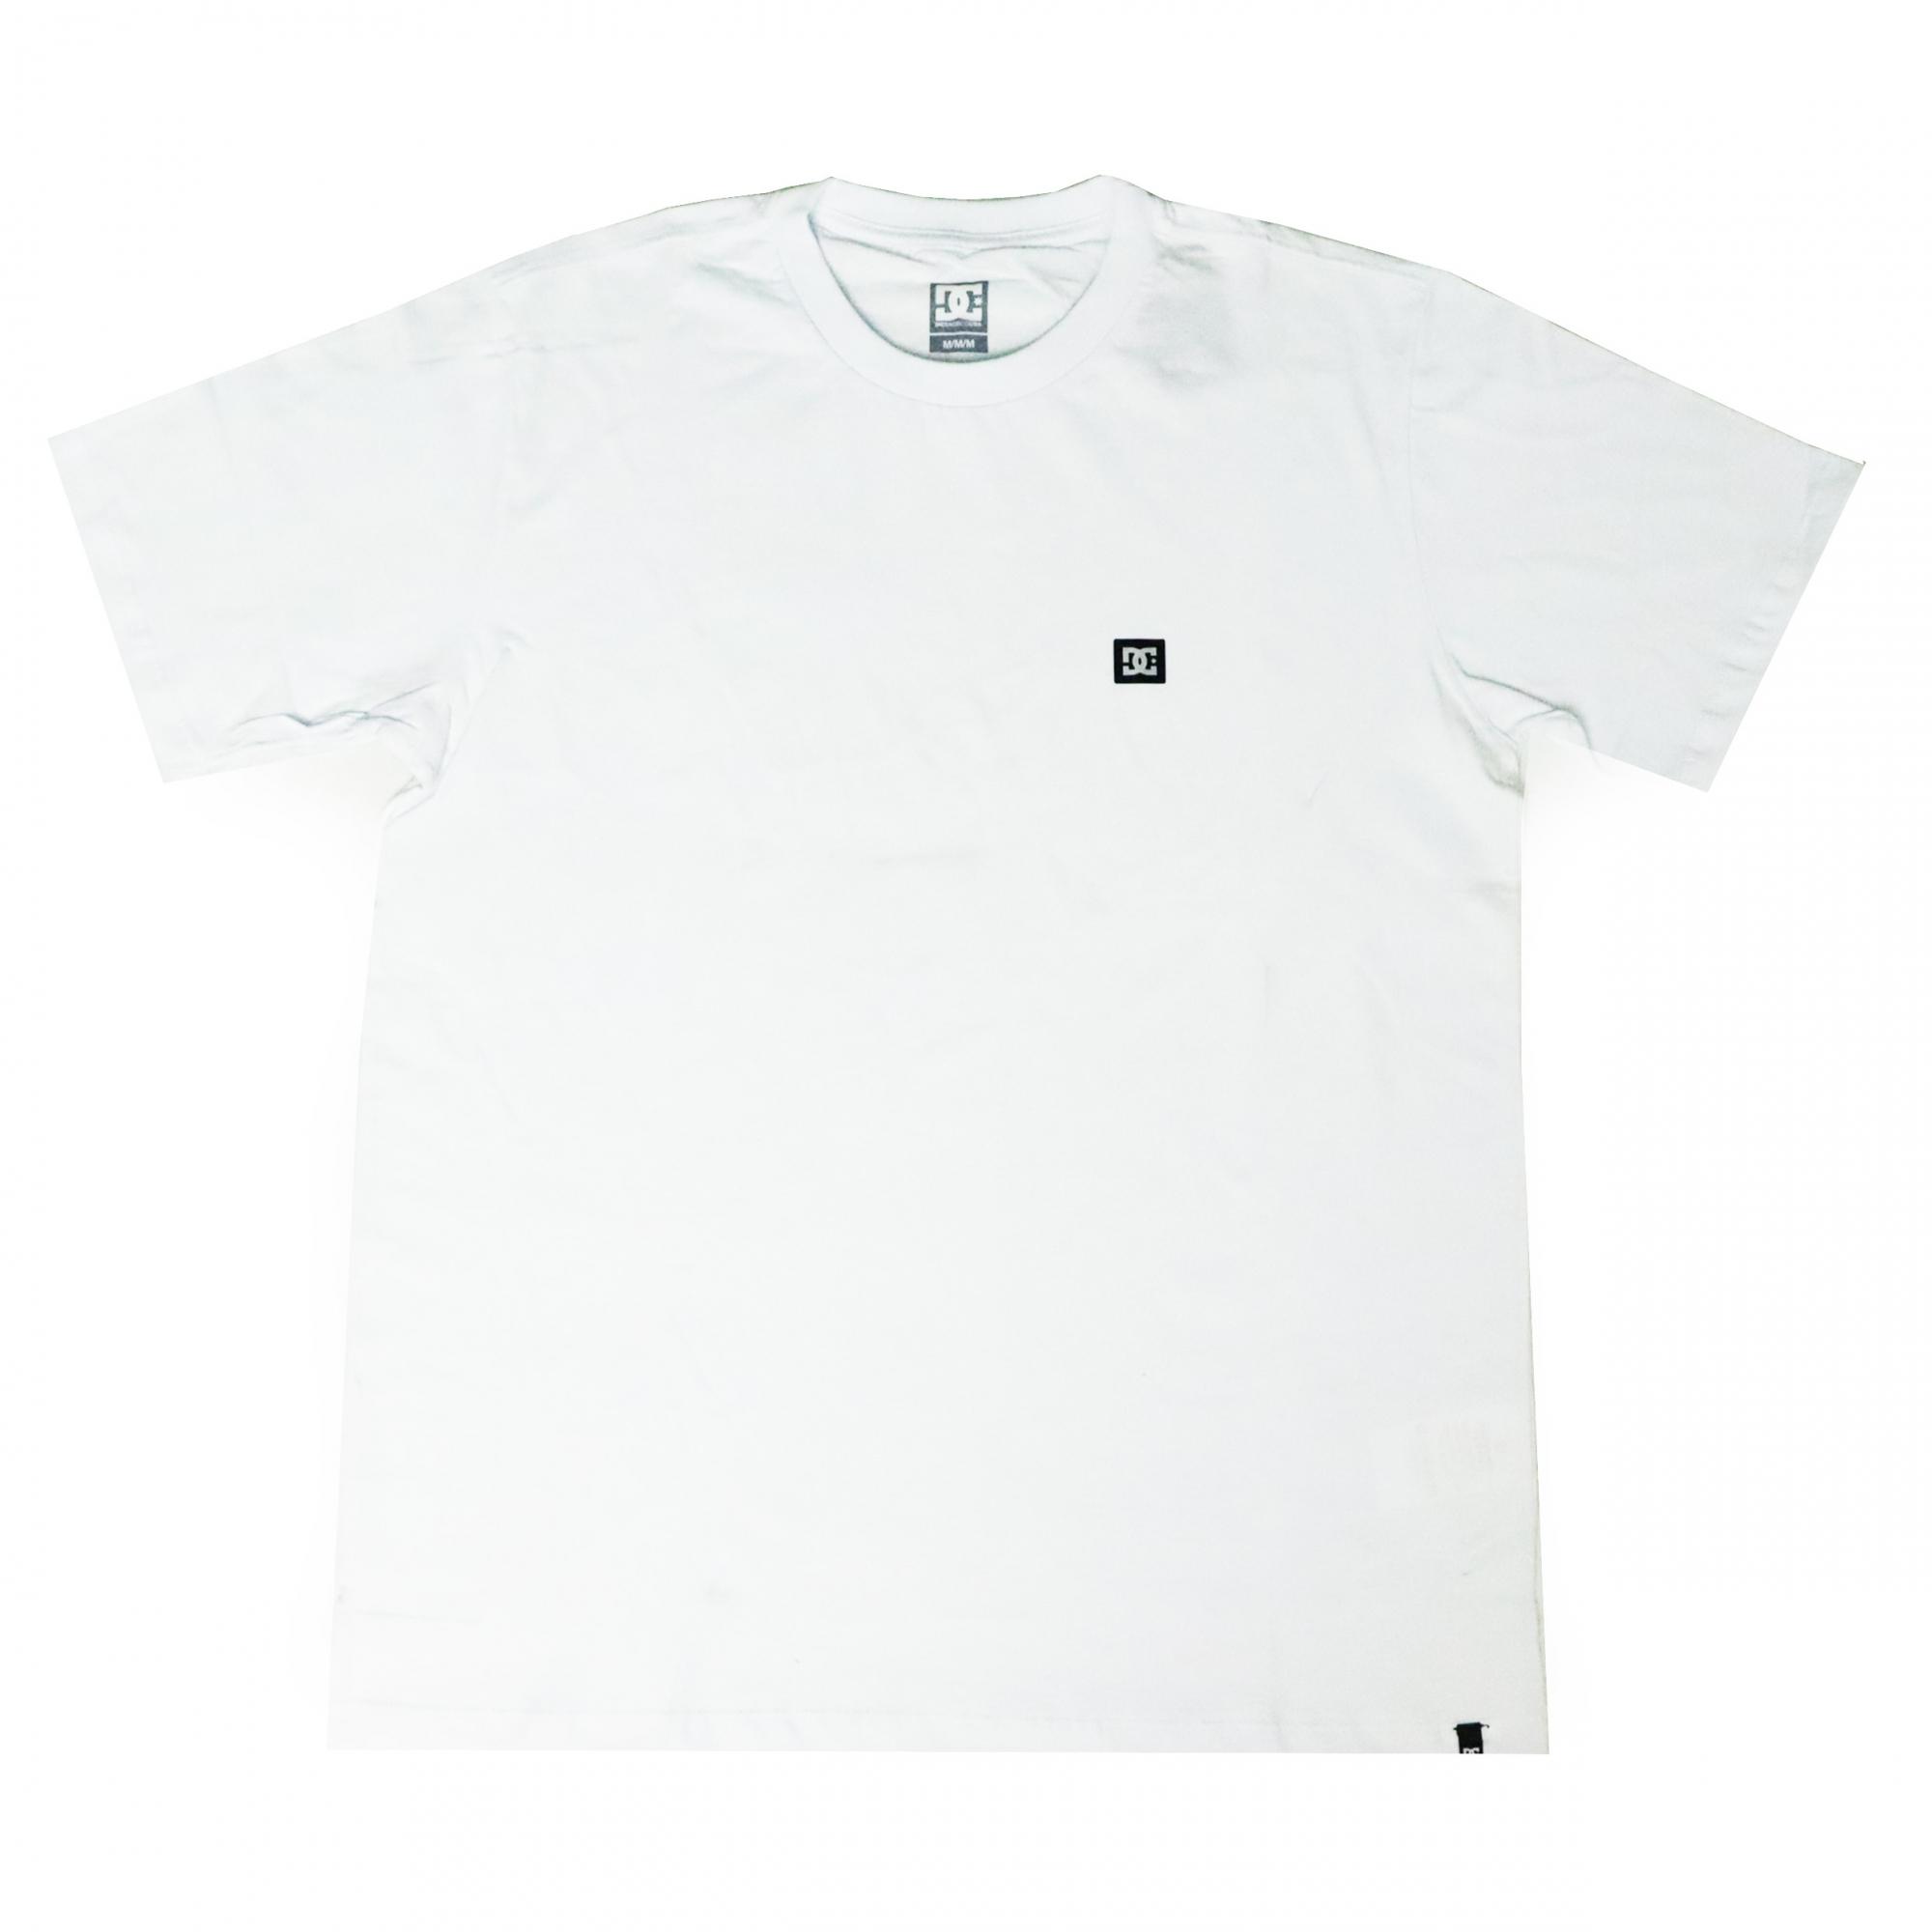 Camiseta DC Shoes Super Transfer - Branco